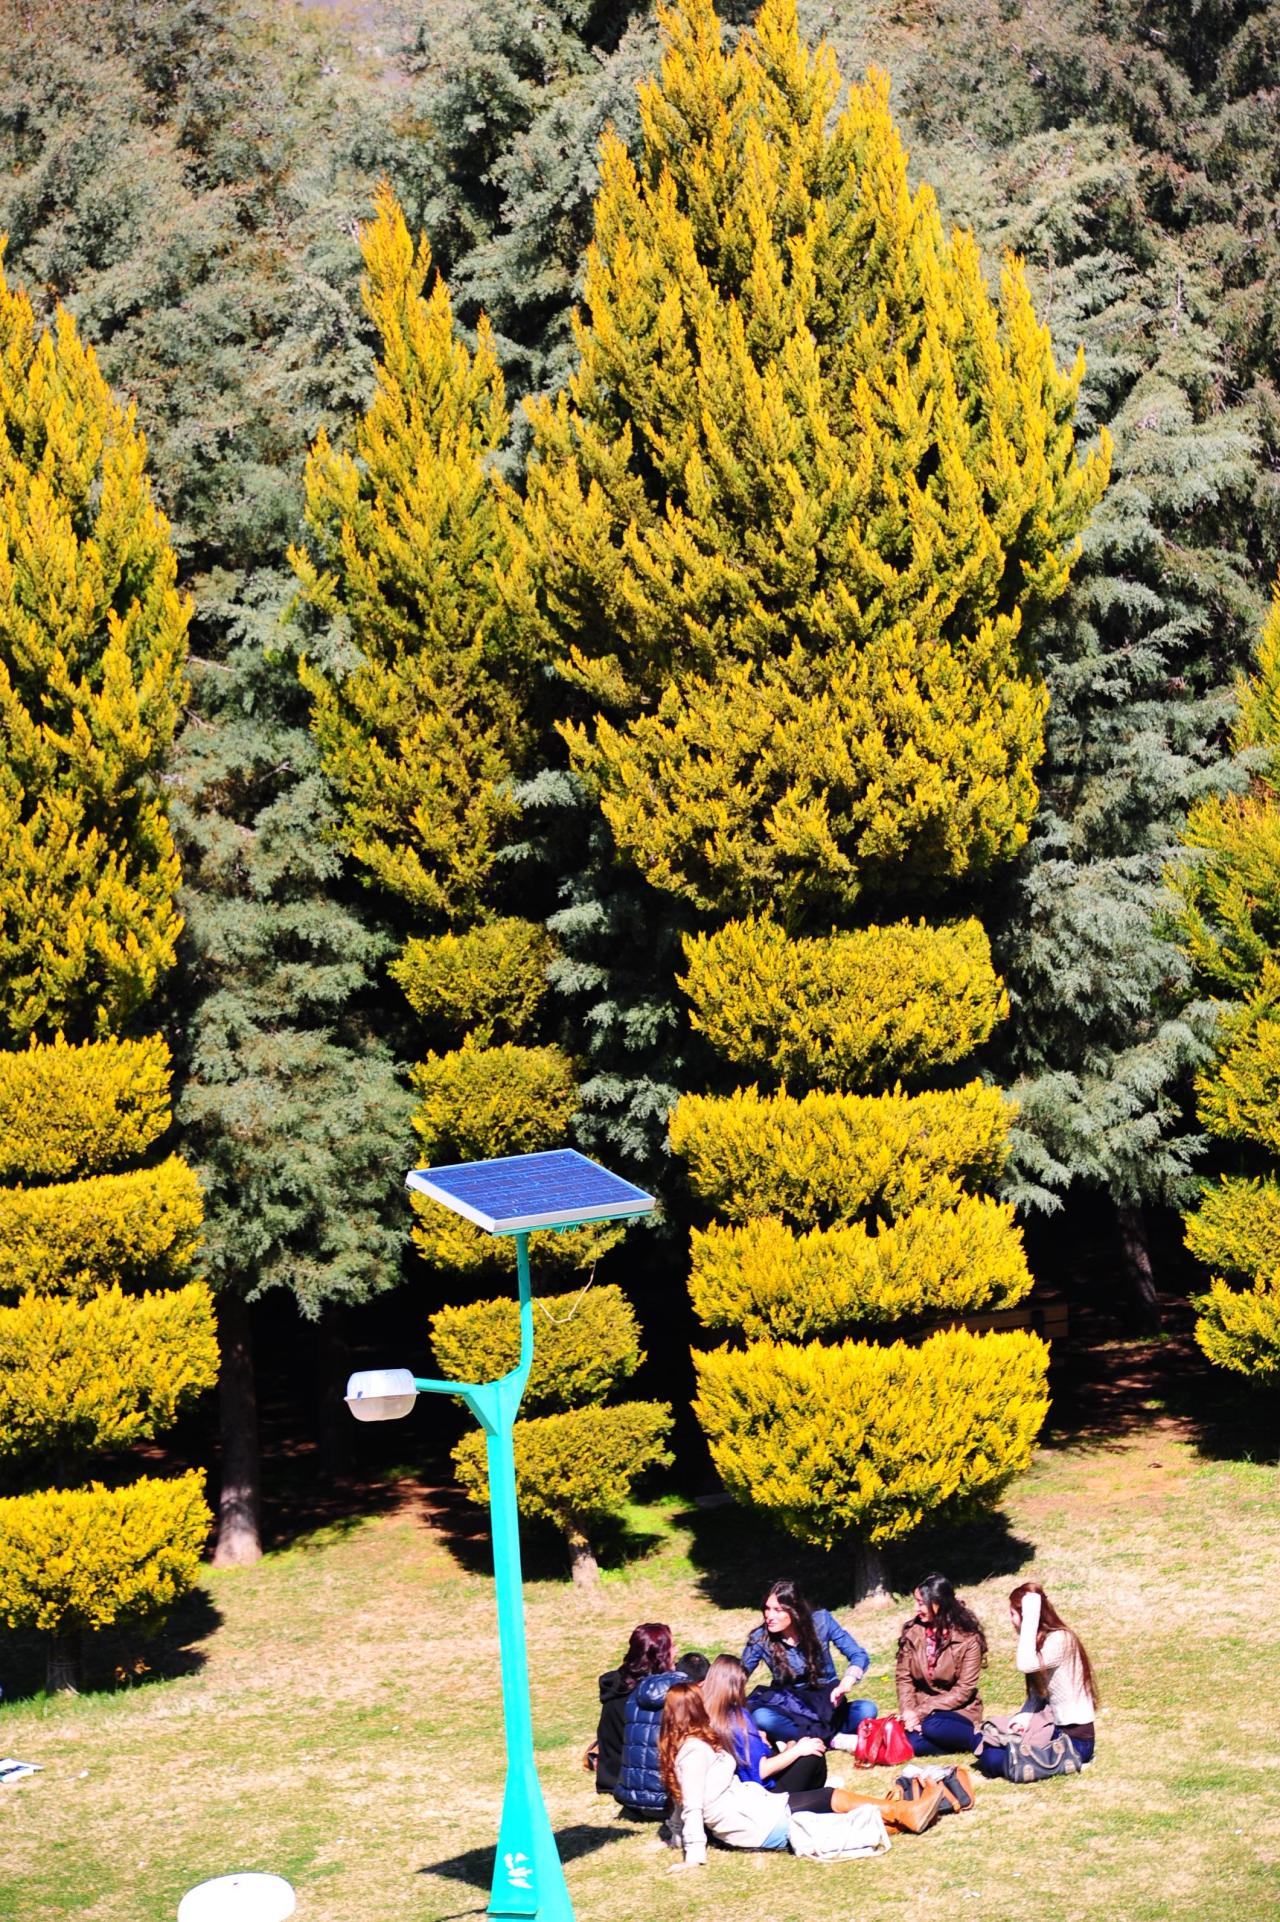 MSKÜ Is Amongst The Greenest Universities of The World